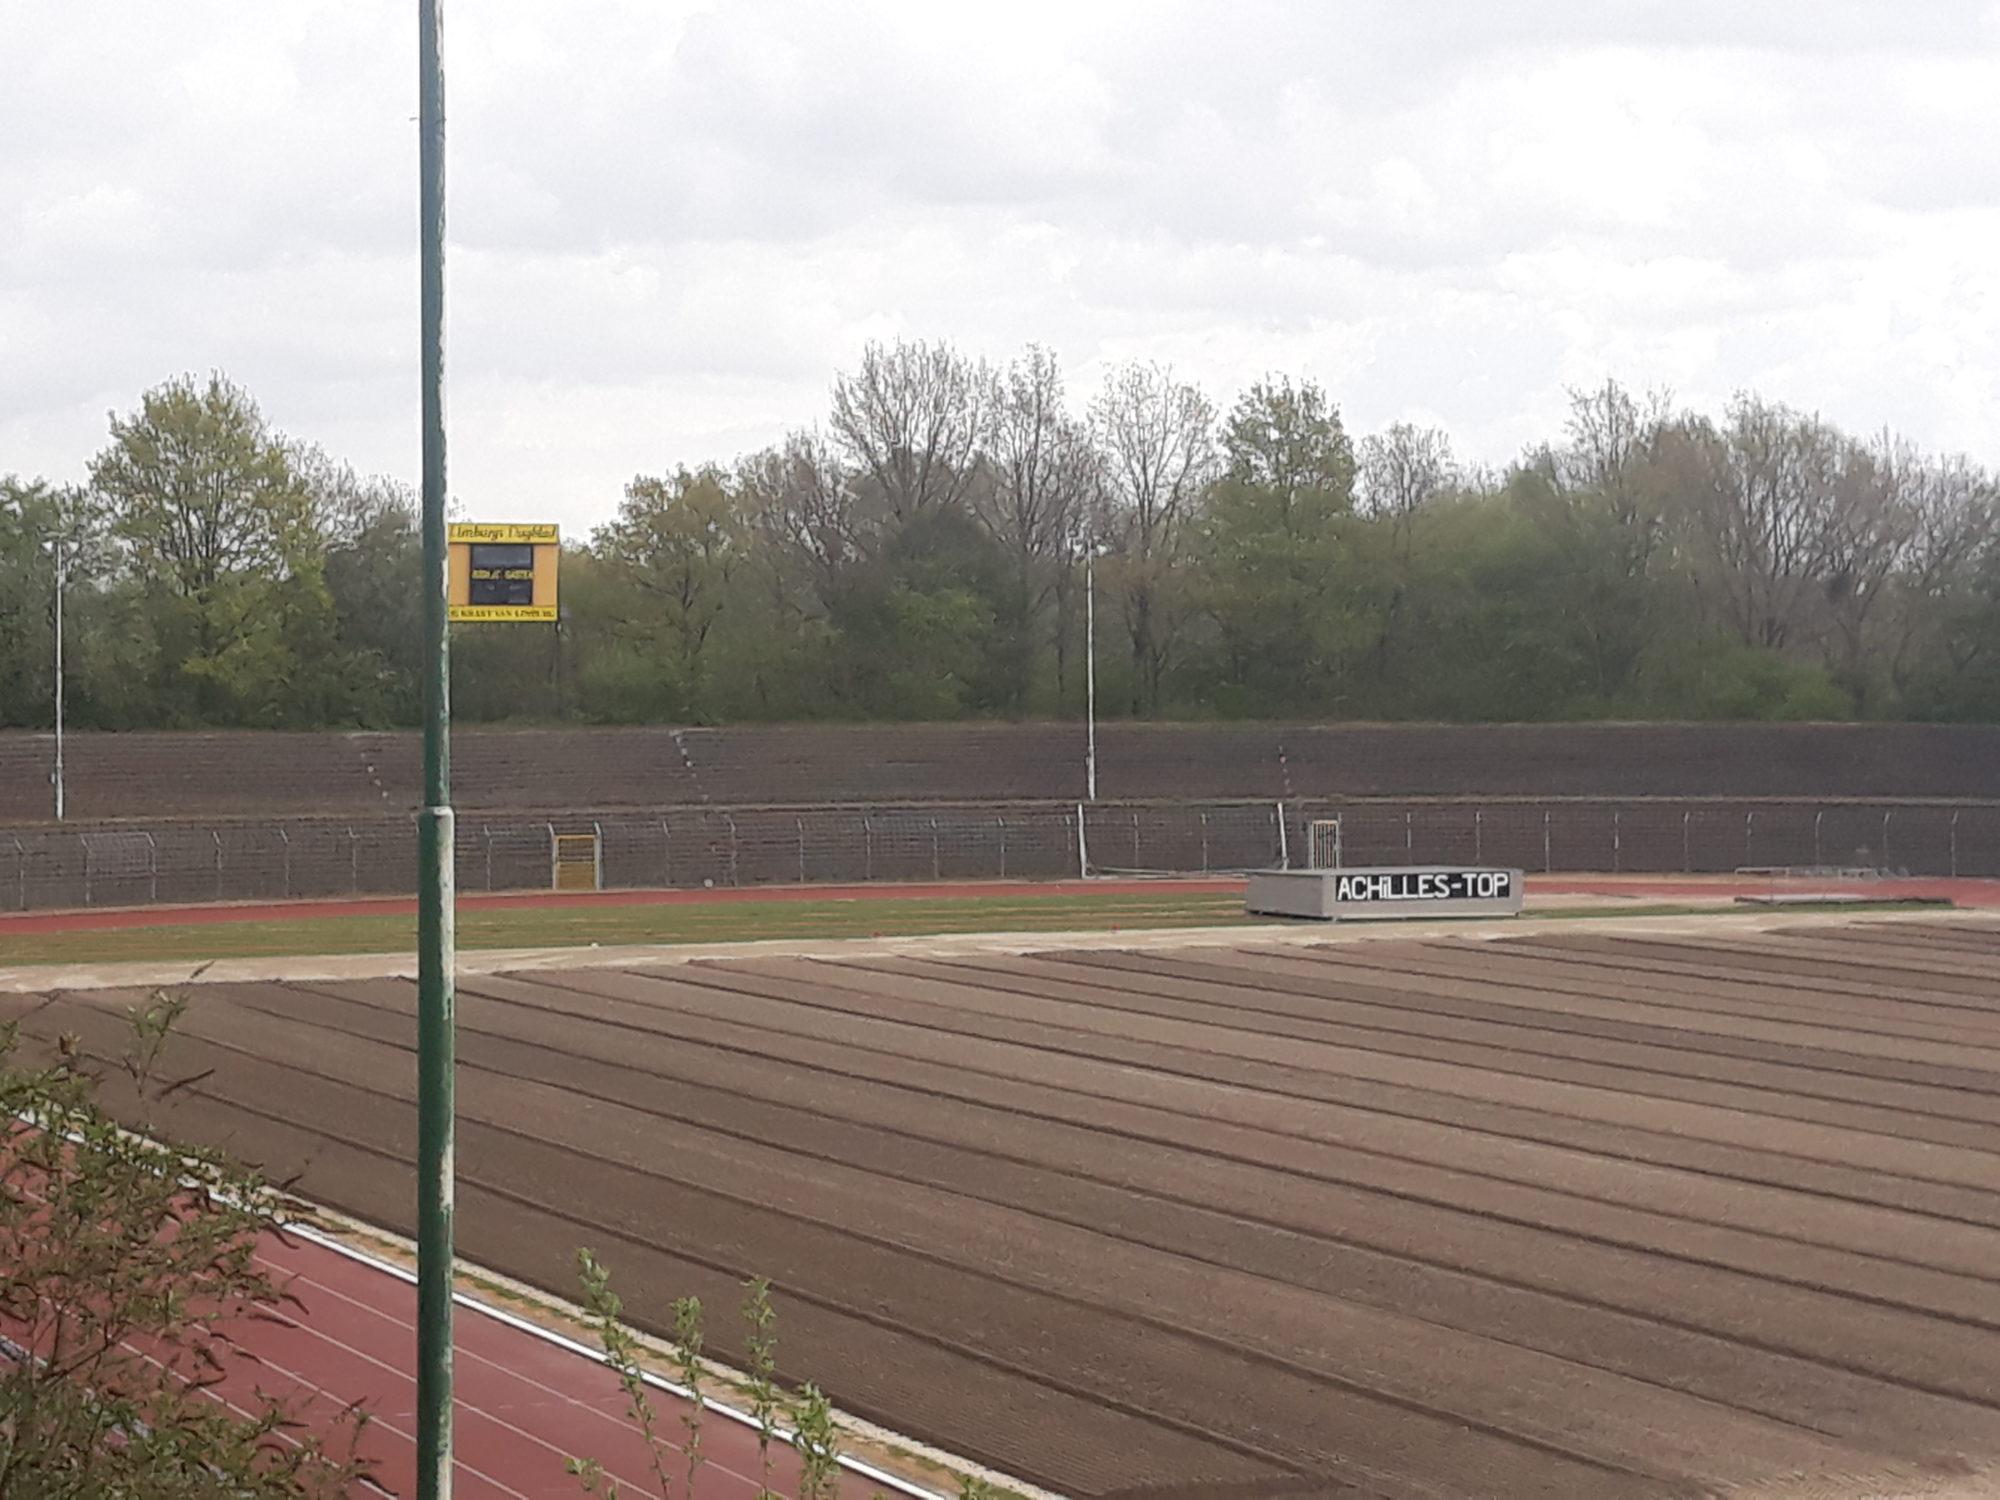 Gemeentelijk Sportpark Kaalheide anno 2021